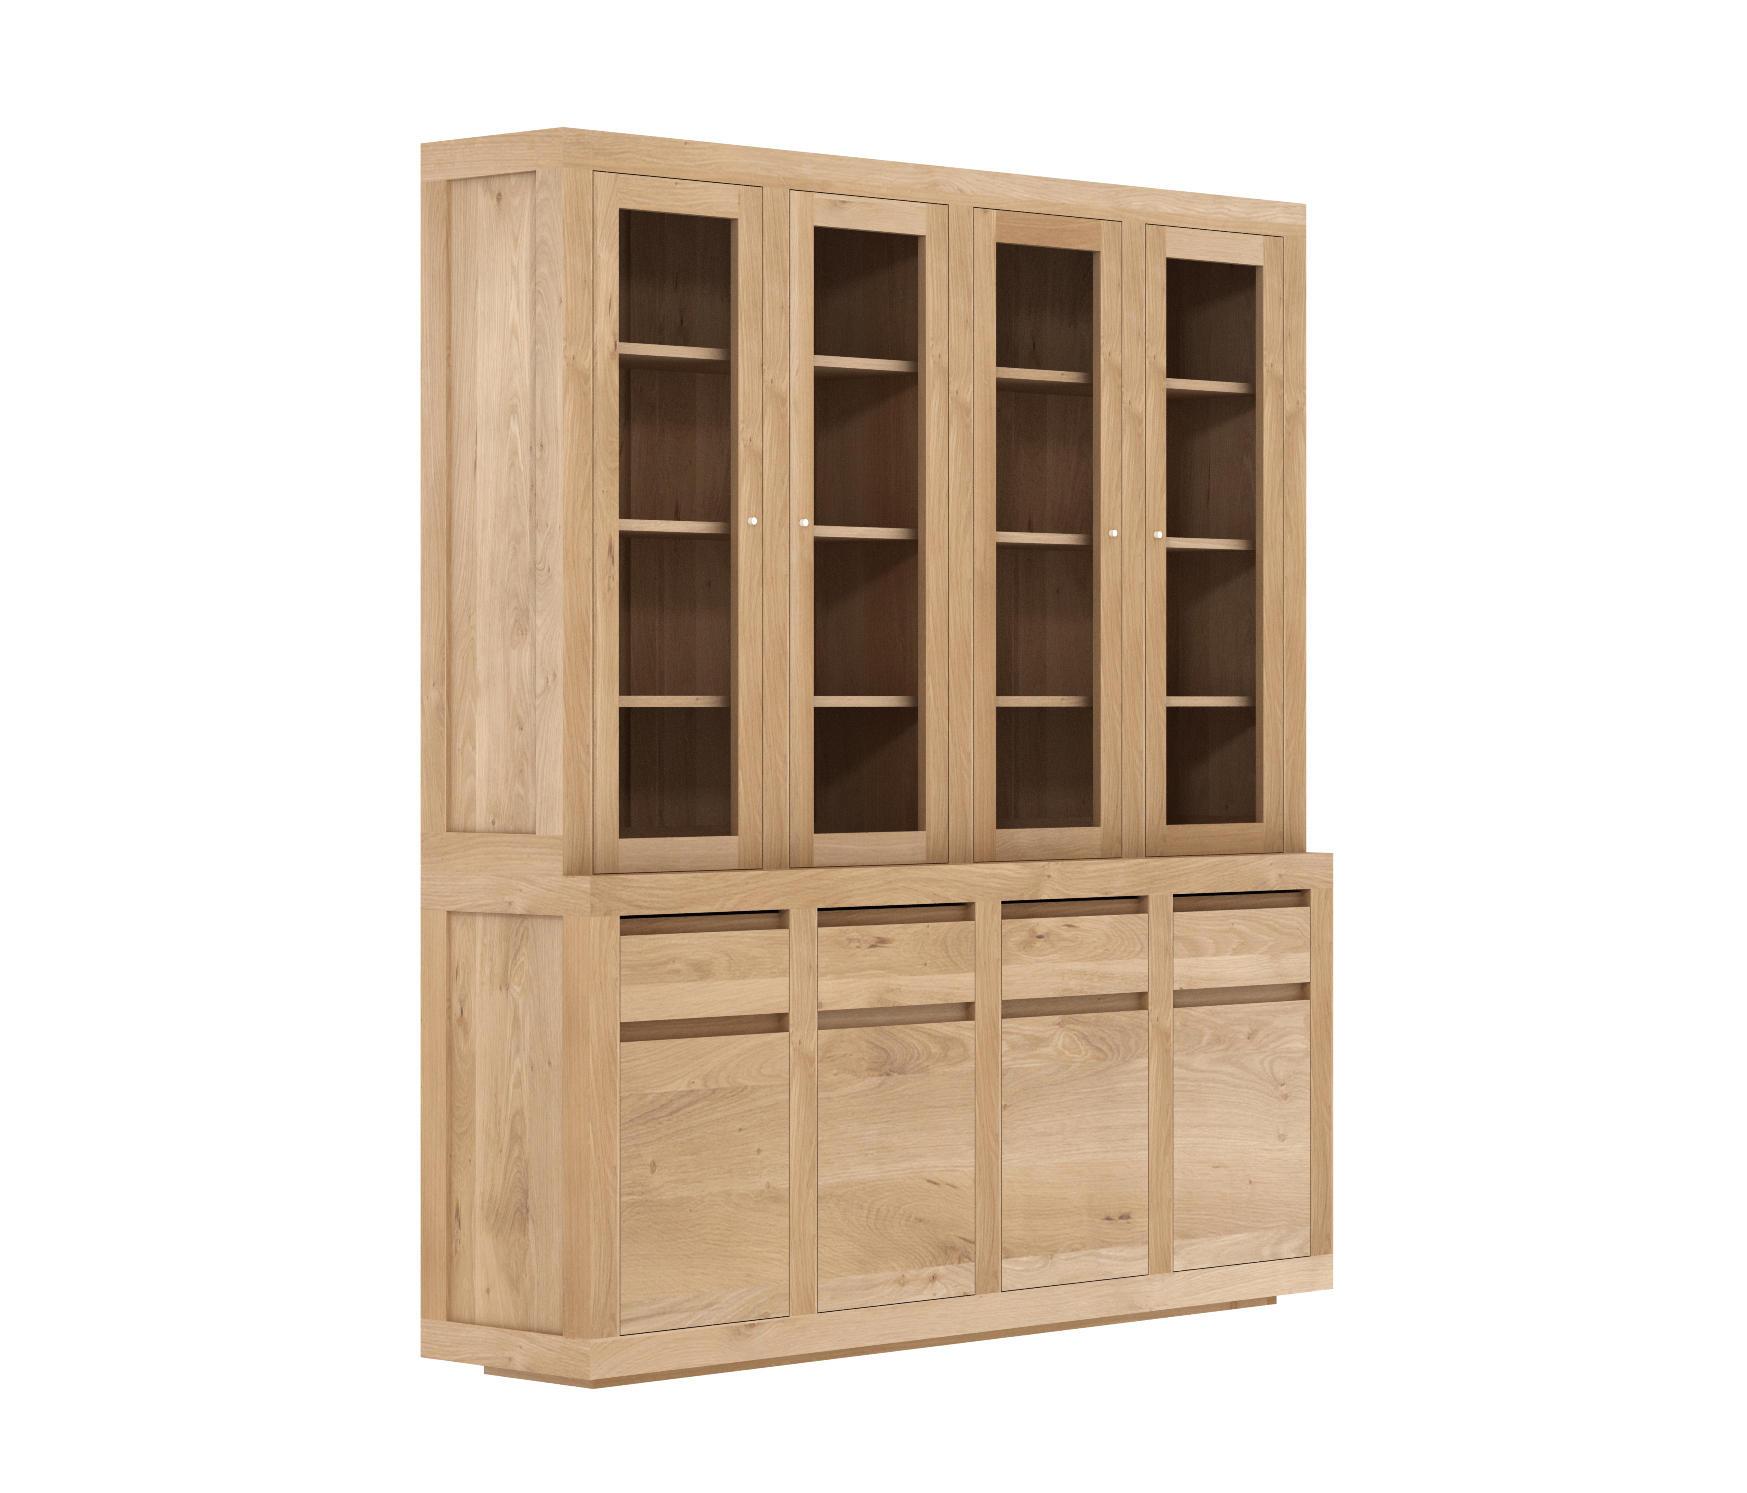 antique sold hutch doors china sideboard door cabinet stained glass oak with scandinavian shop